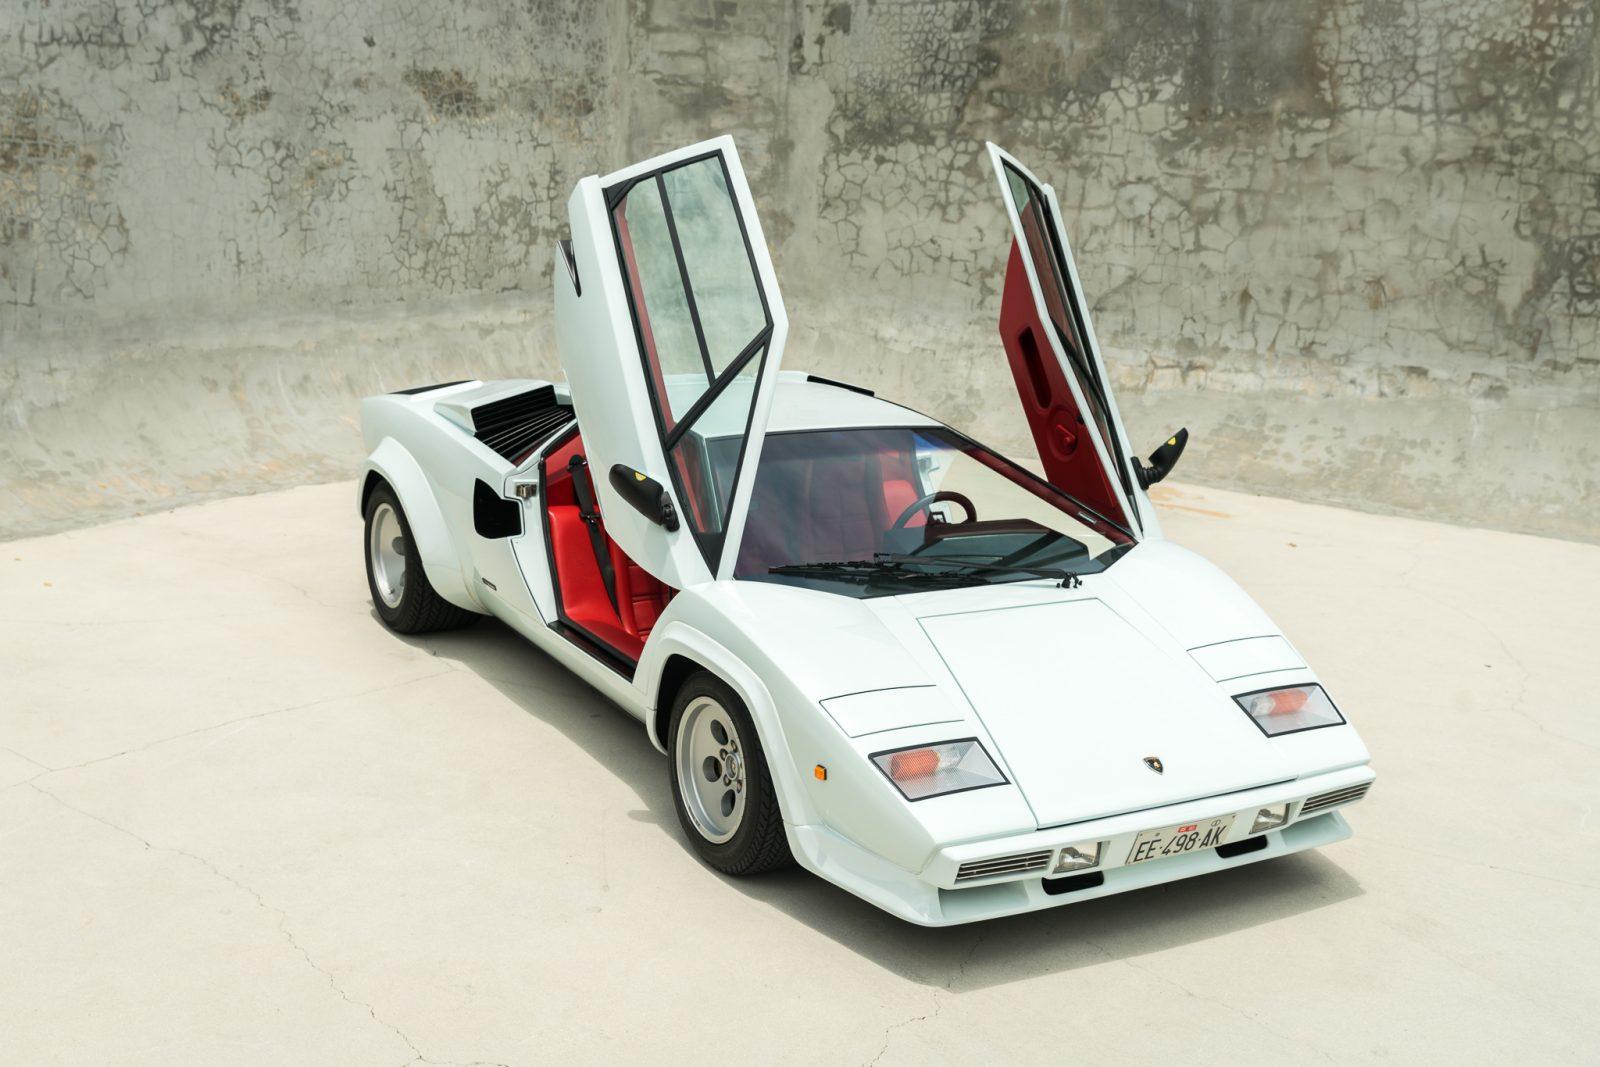 1985 Lamborghini Countach Downdraft For Sale Curated C